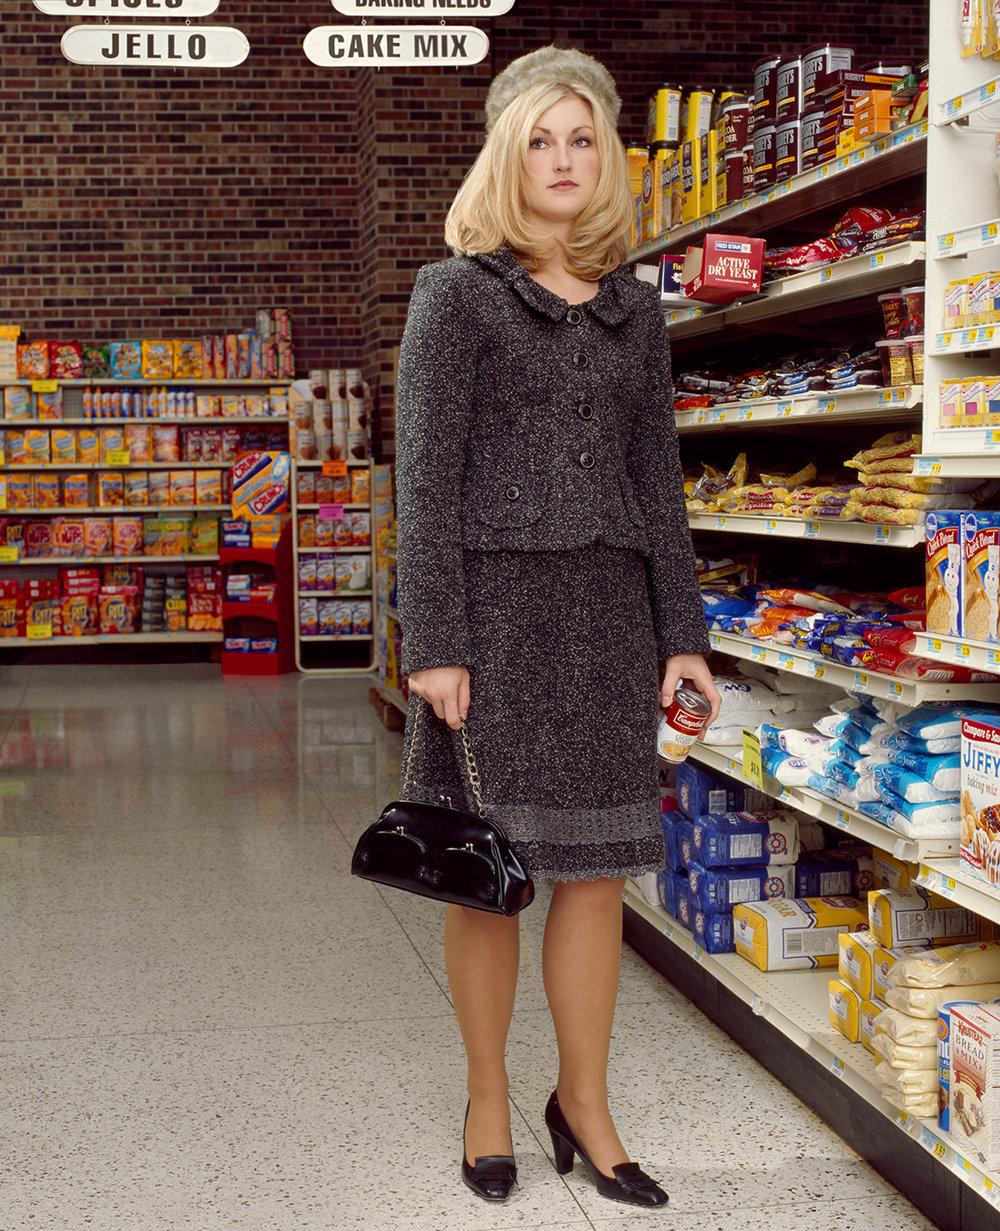 Grocery - 2006   Media Stories